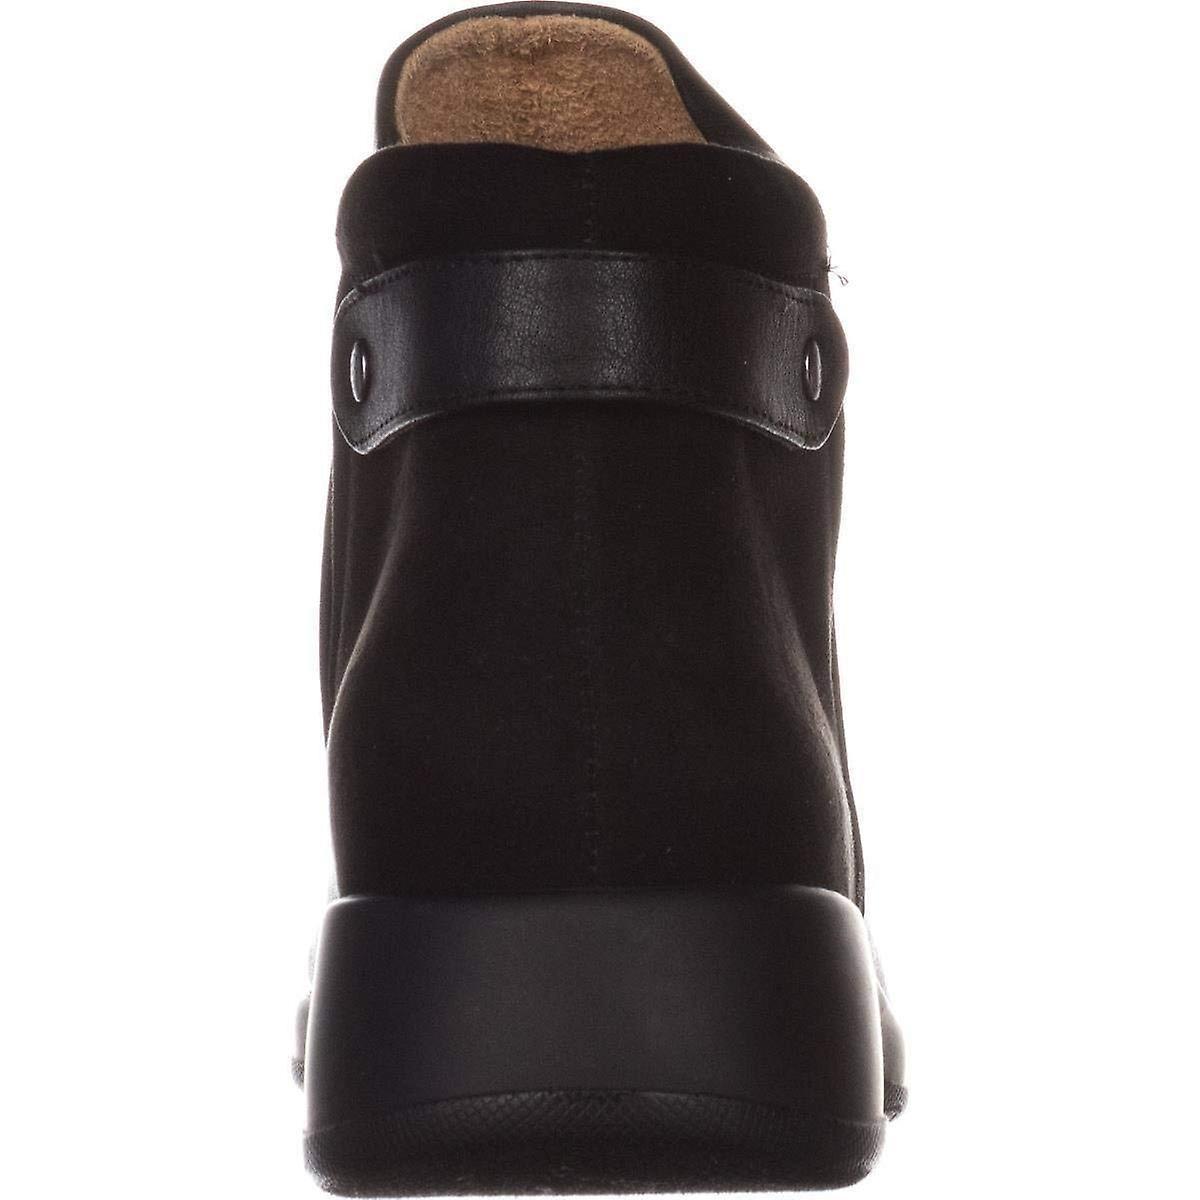 06c854ddb23fa Naturalizer Womens Barita Round Toe Ankle Chelsea Boots | Fruugo